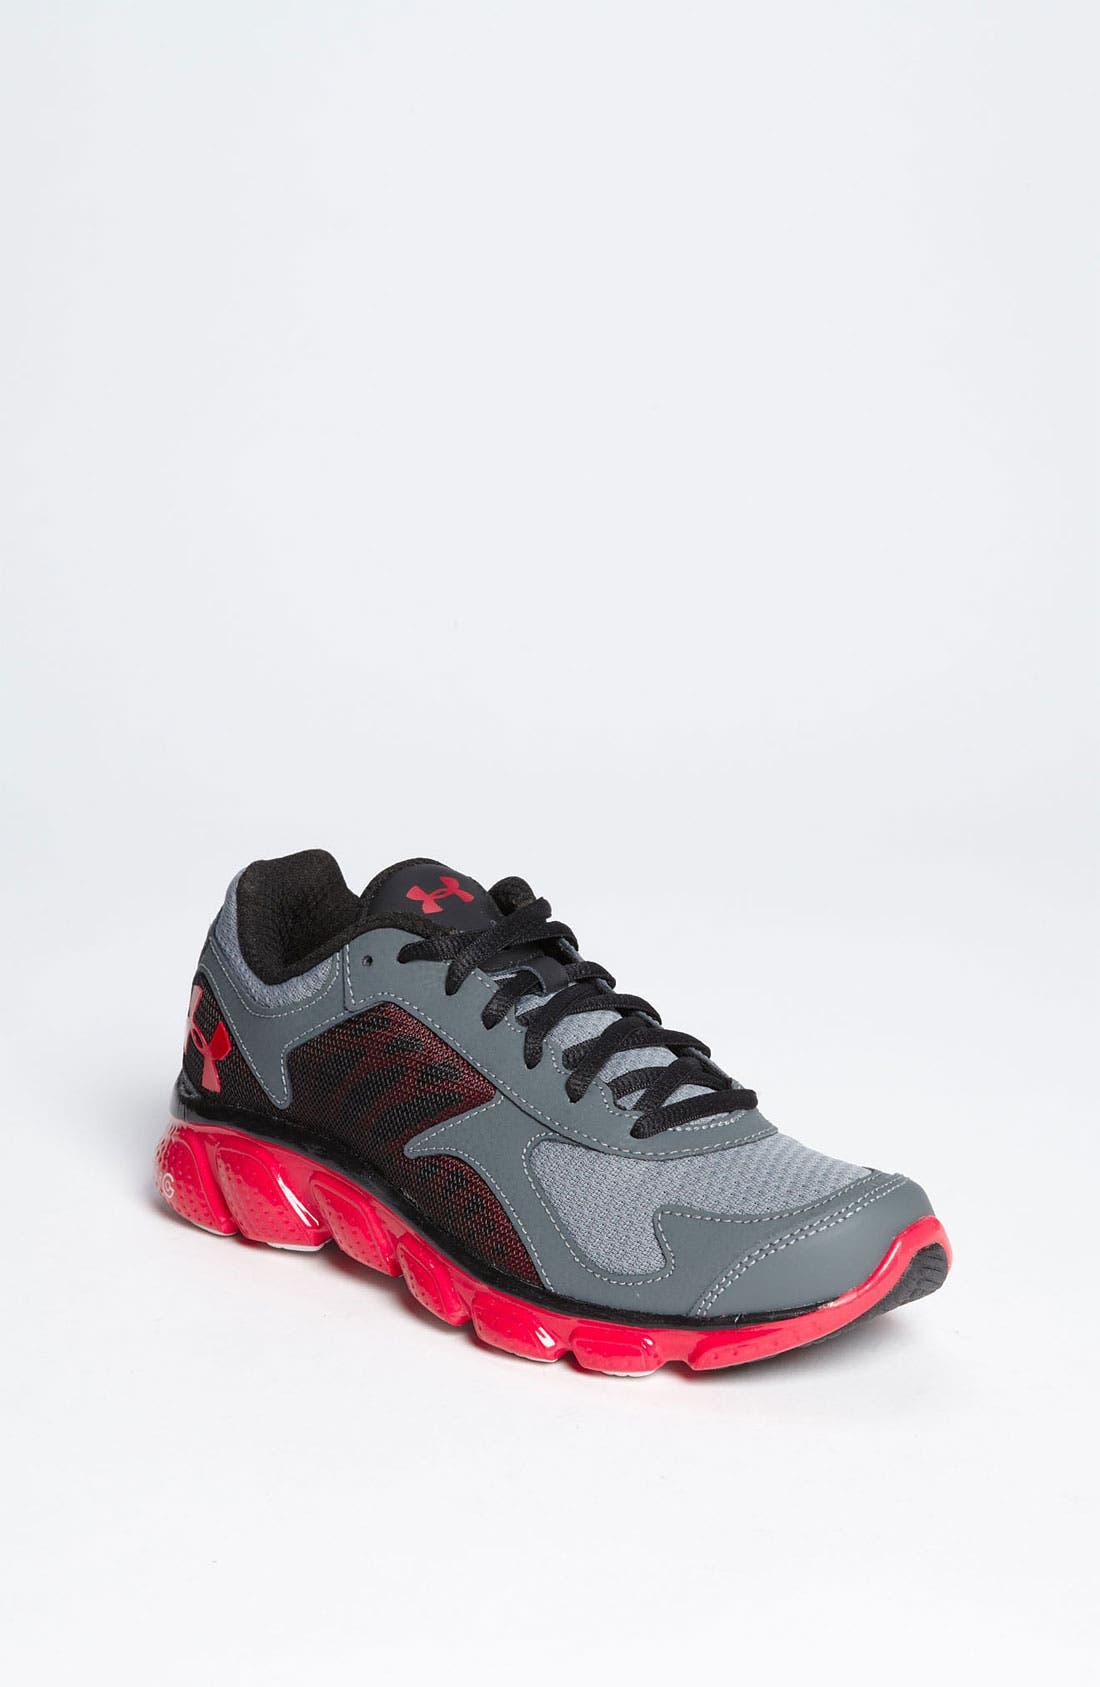 Main Image - Under Armour 'Micro G® Skulpt' Sneaker (Toddler, Little Kid & Big Kid)